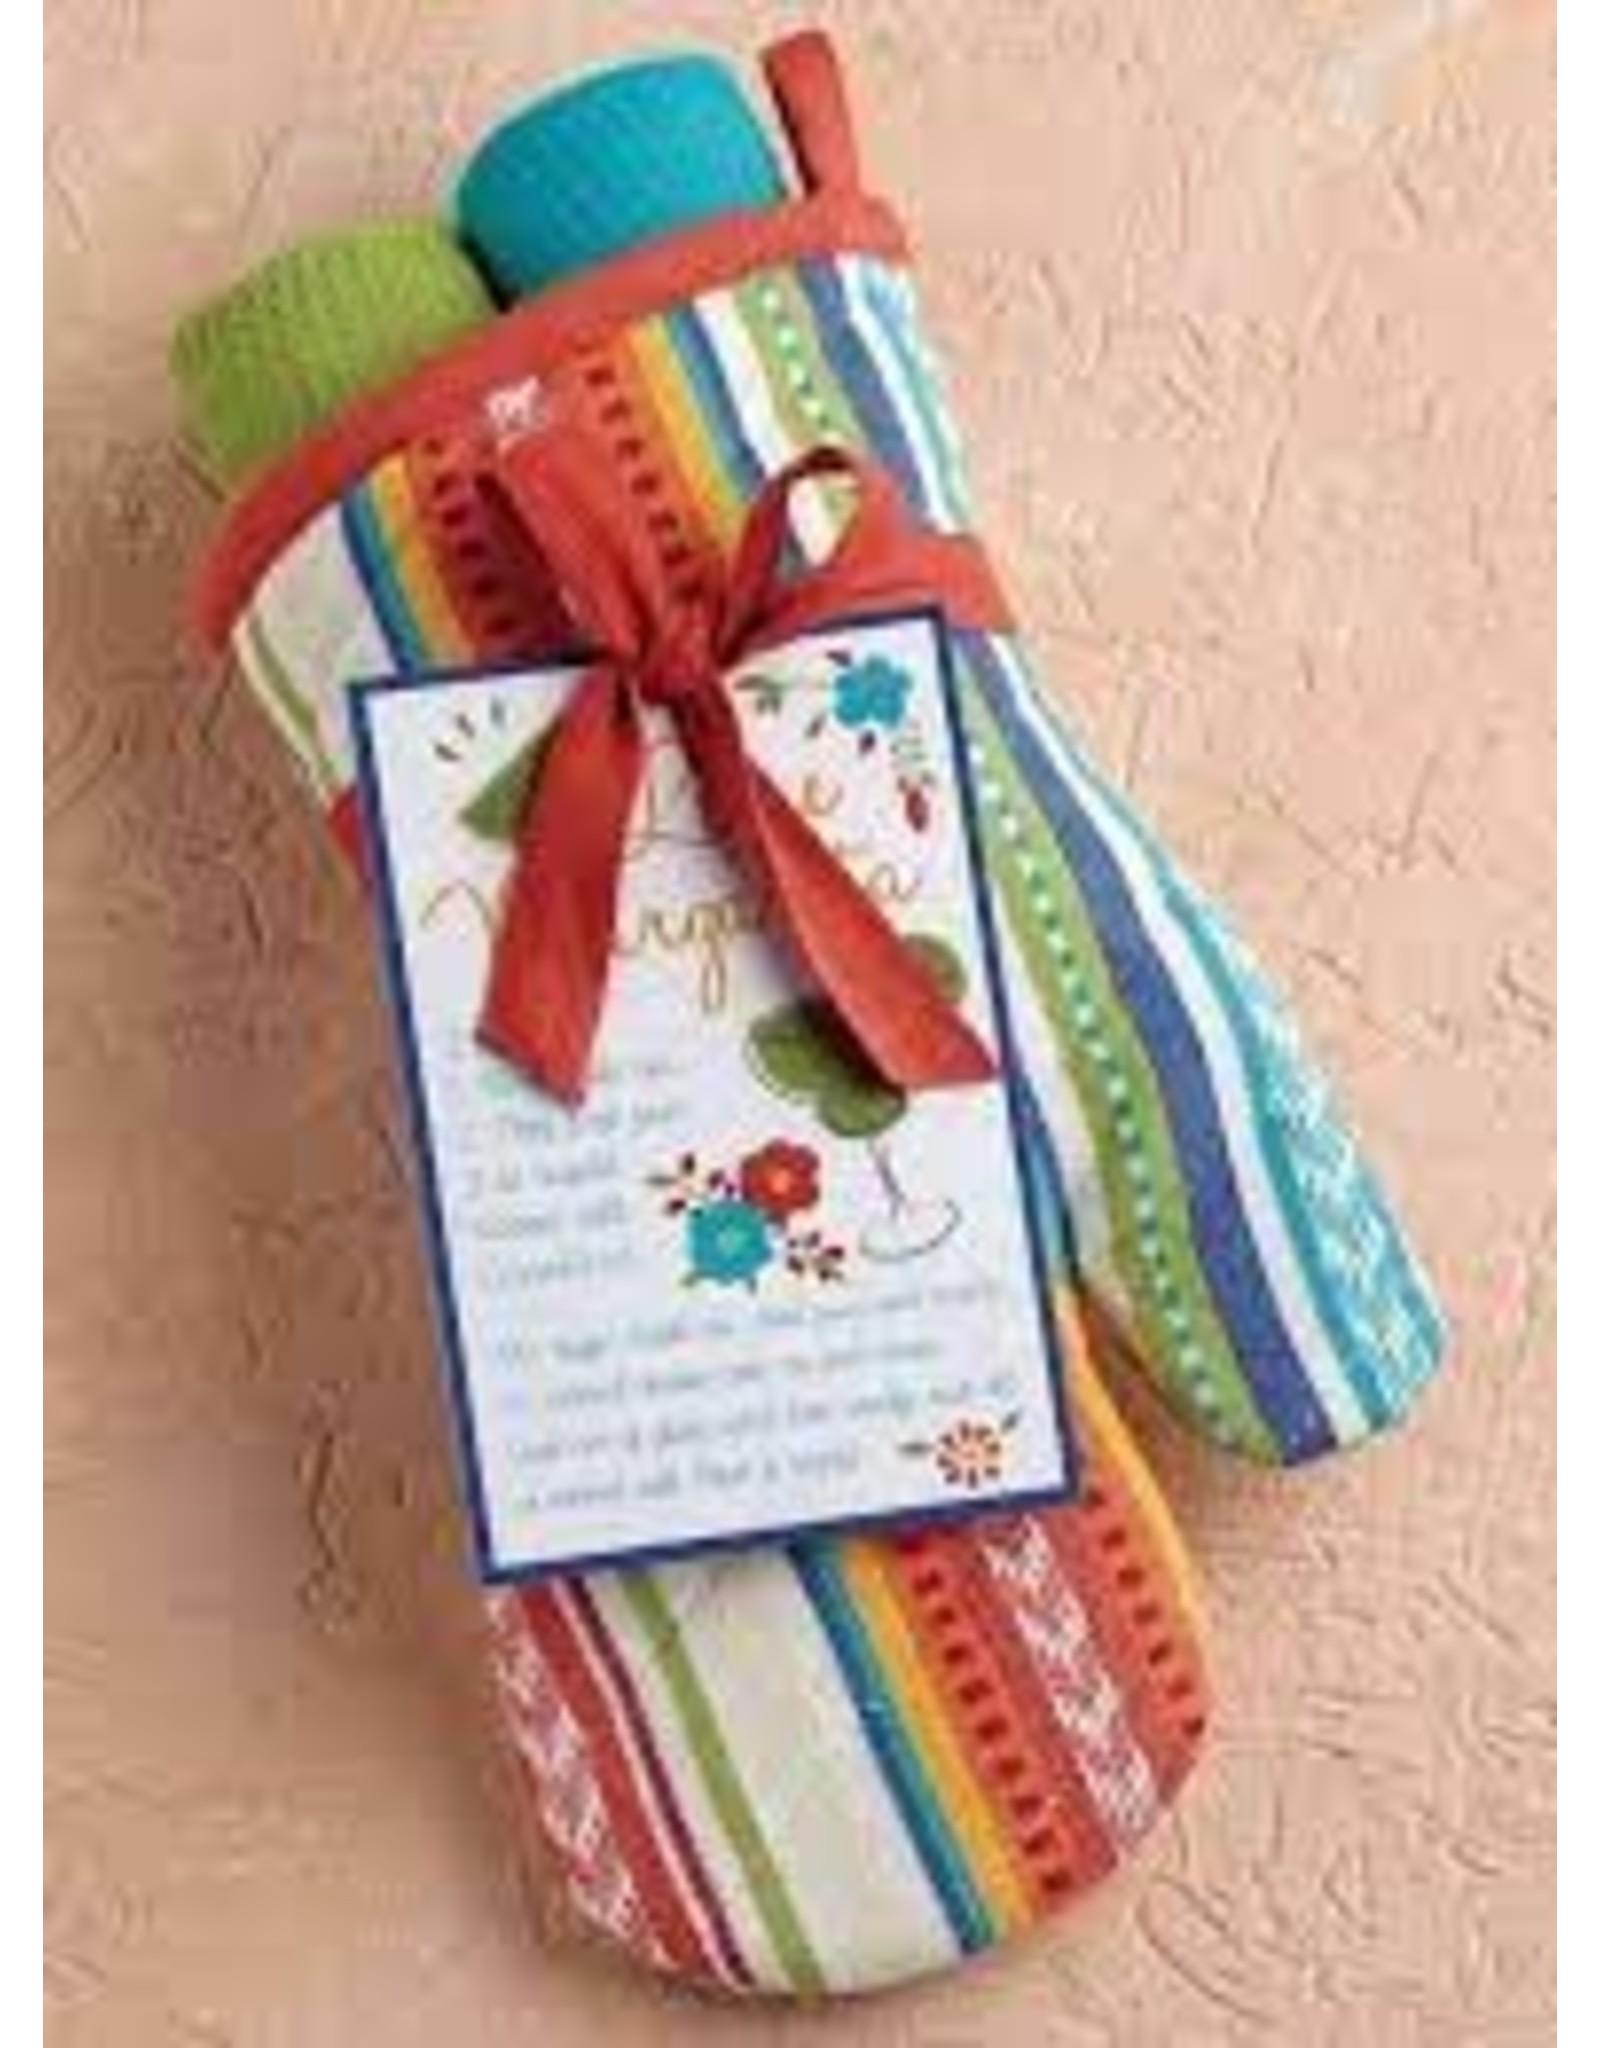 Design Imports DI Baja Cantina Oven Mitt Gift Set